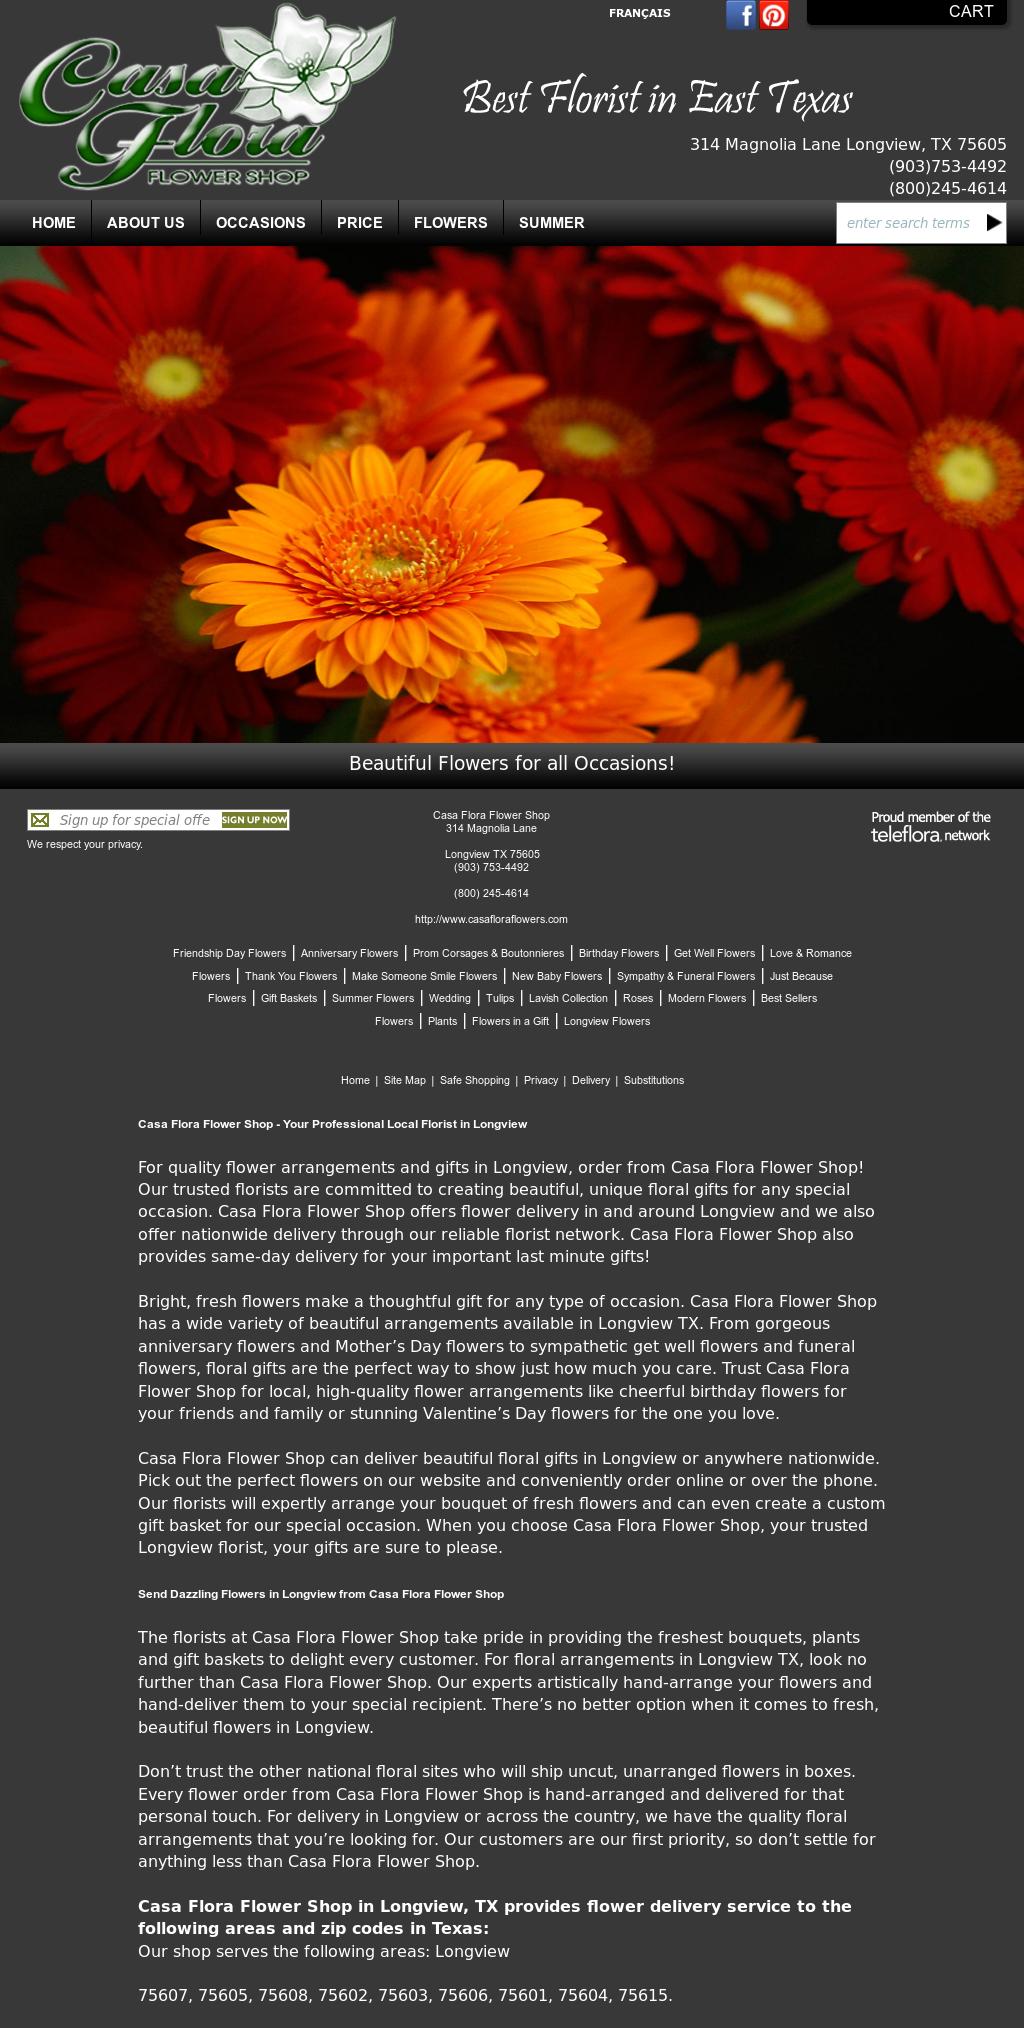 Casa Flora Flower Shop* Competitors, Revenue and Employees - Owler Company Profile